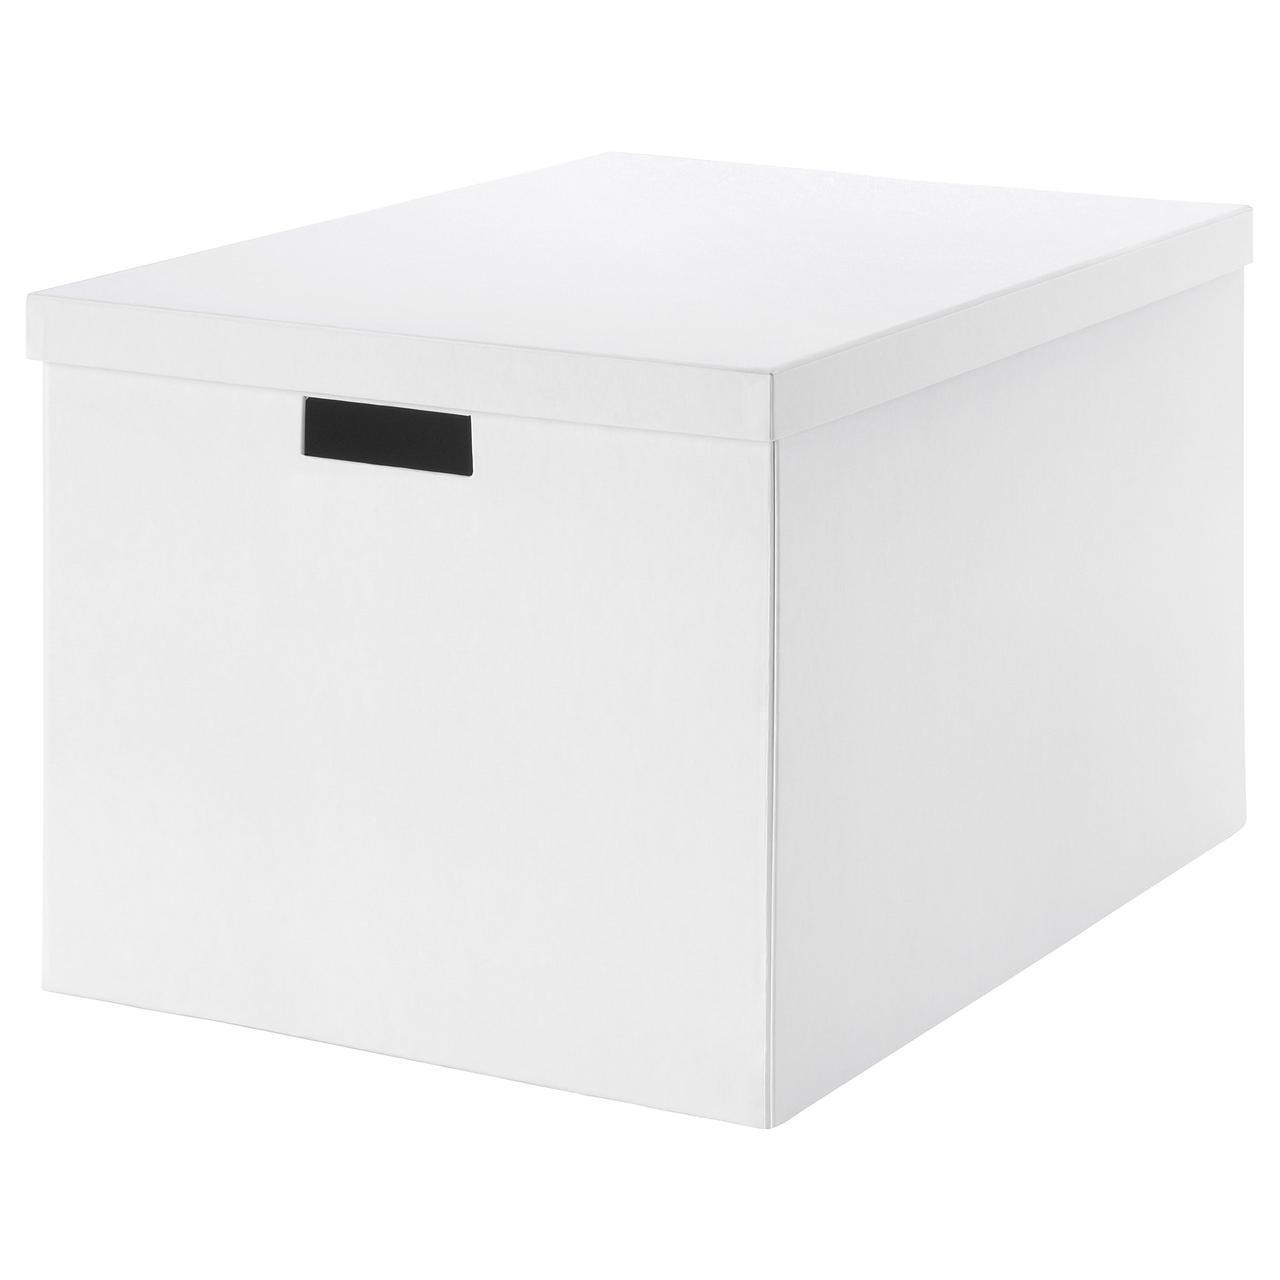 Коробка с крышкой IKEA TJENA 35x50x30 см белая 903.743.49